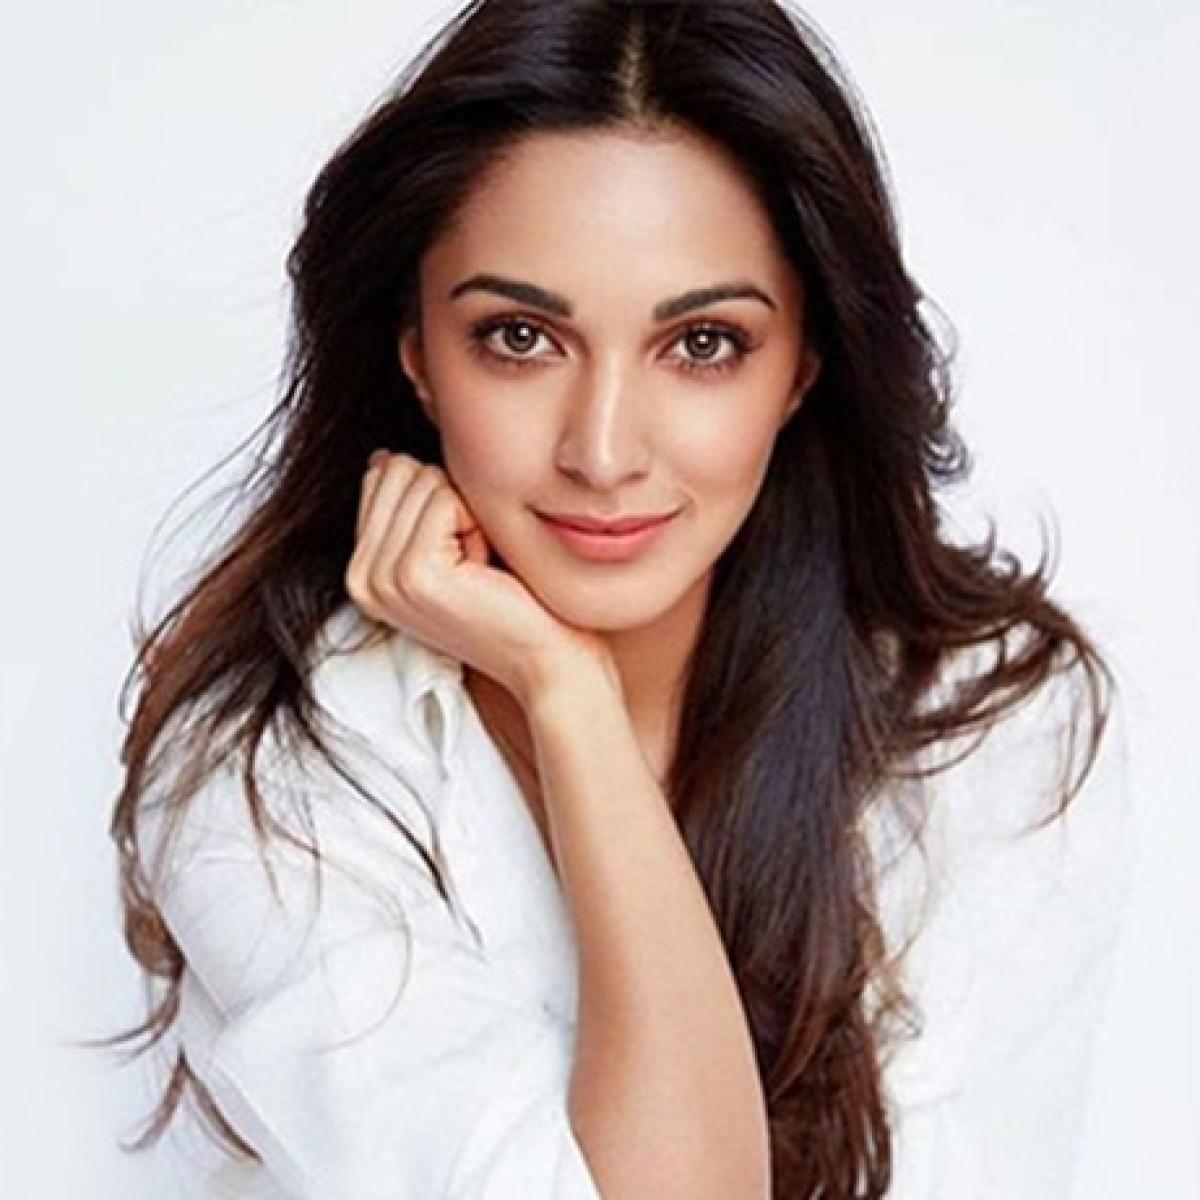 Kiara Advani has a surprise visitor on 'Indoo Ki Jawani' sets